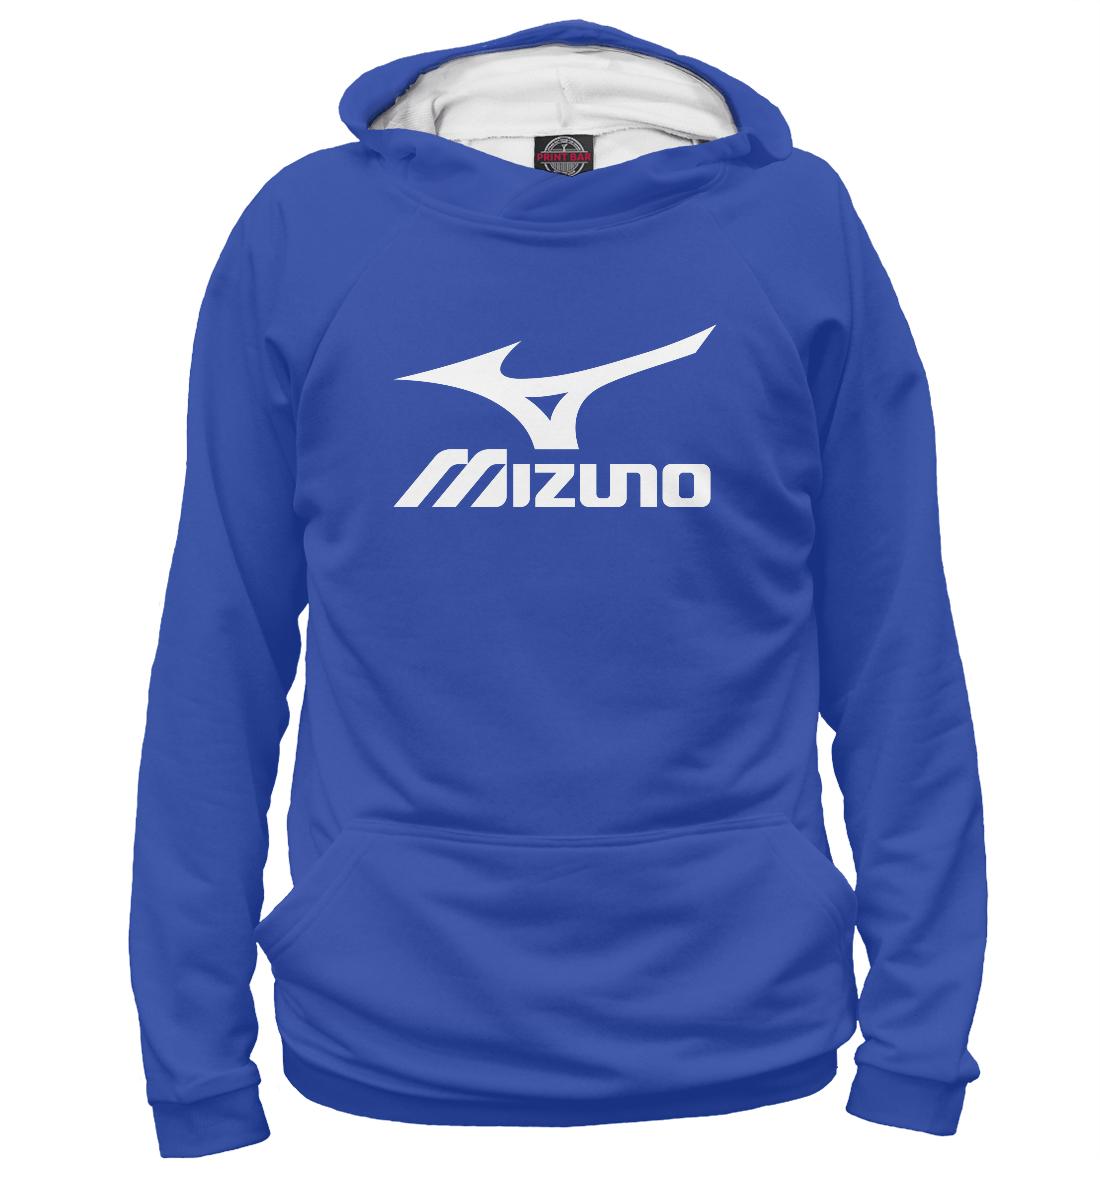 Купить Volleyball (Mizuno), Printbar, Худи, VLB-803428-hud-2